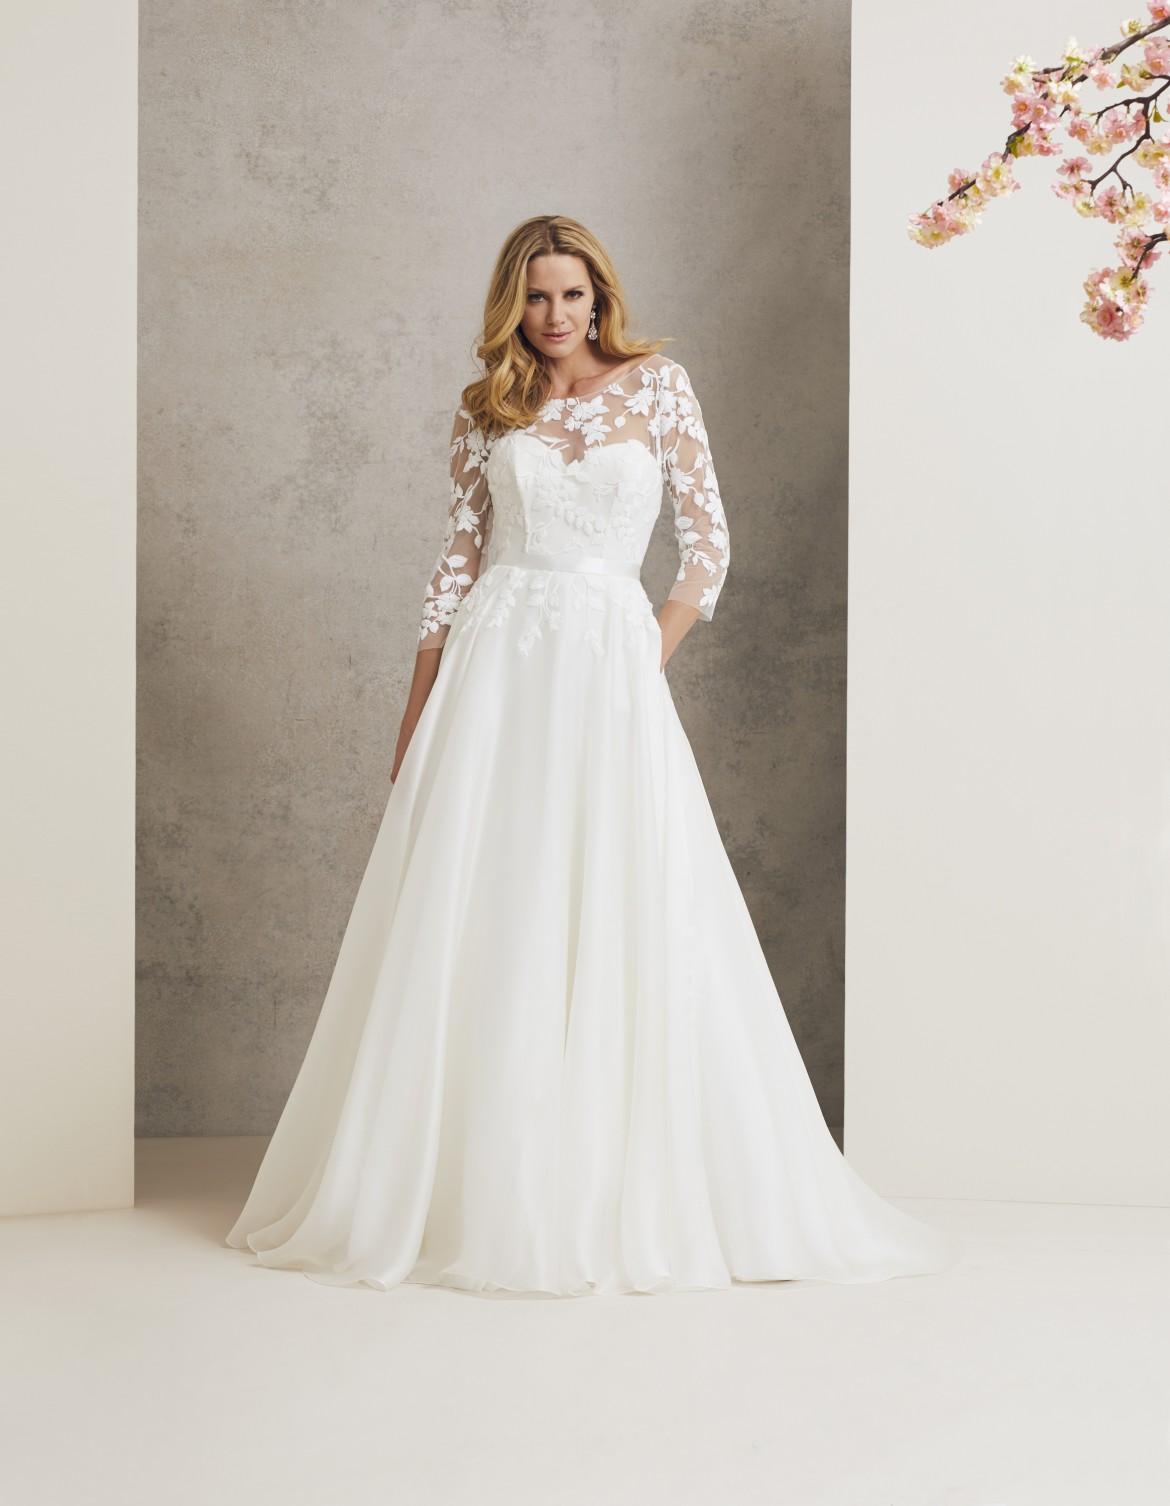 Burgundy designer wedding dress by Caroline Castigliano